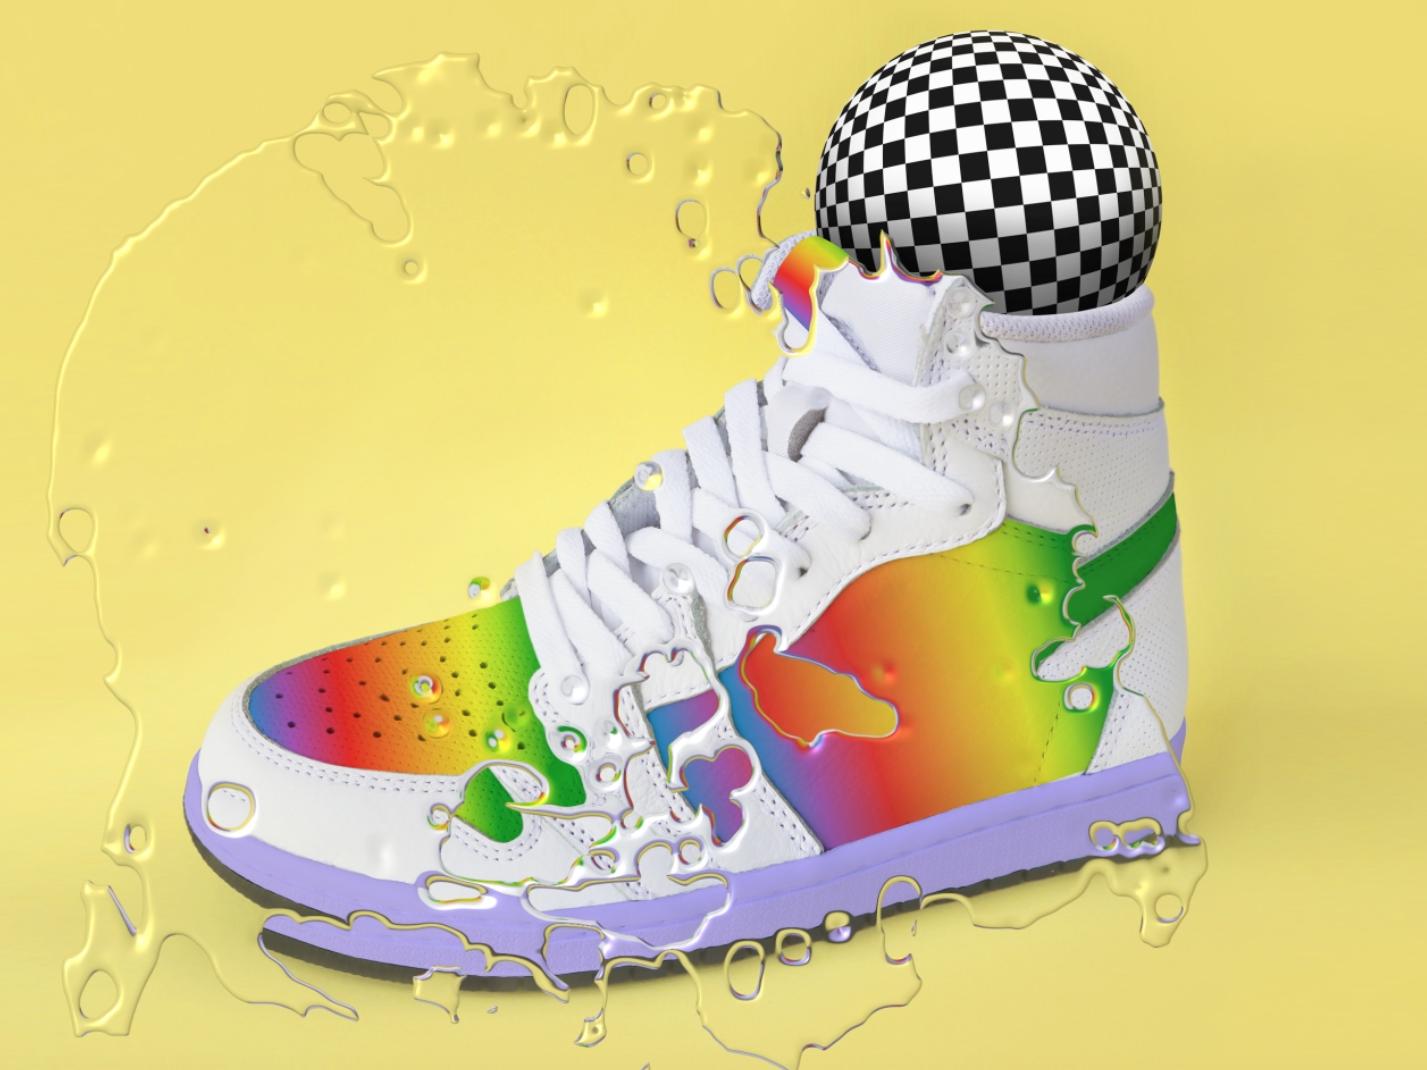 Sneaker Illustration illustrator poster nike setdesign contemporary art printdesign design graphic graphicdesign distort aftereffect 3d illustrated shoe sneaker illustration